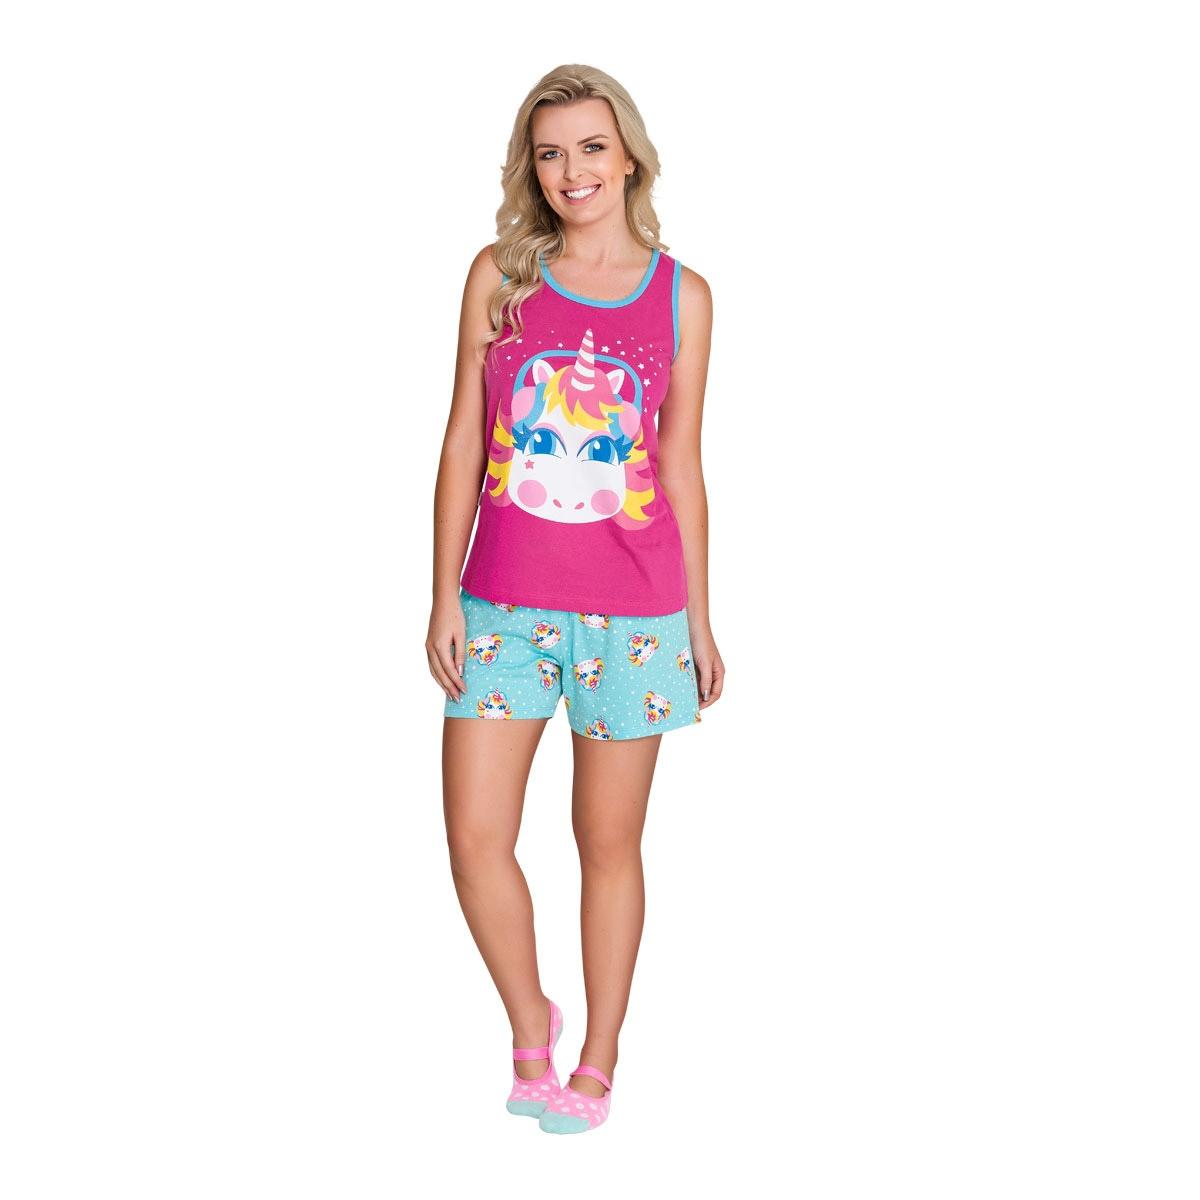 0756e9225a Pijama regata com short adulto - unicórnio - Veggi - Roupão Adulto ...